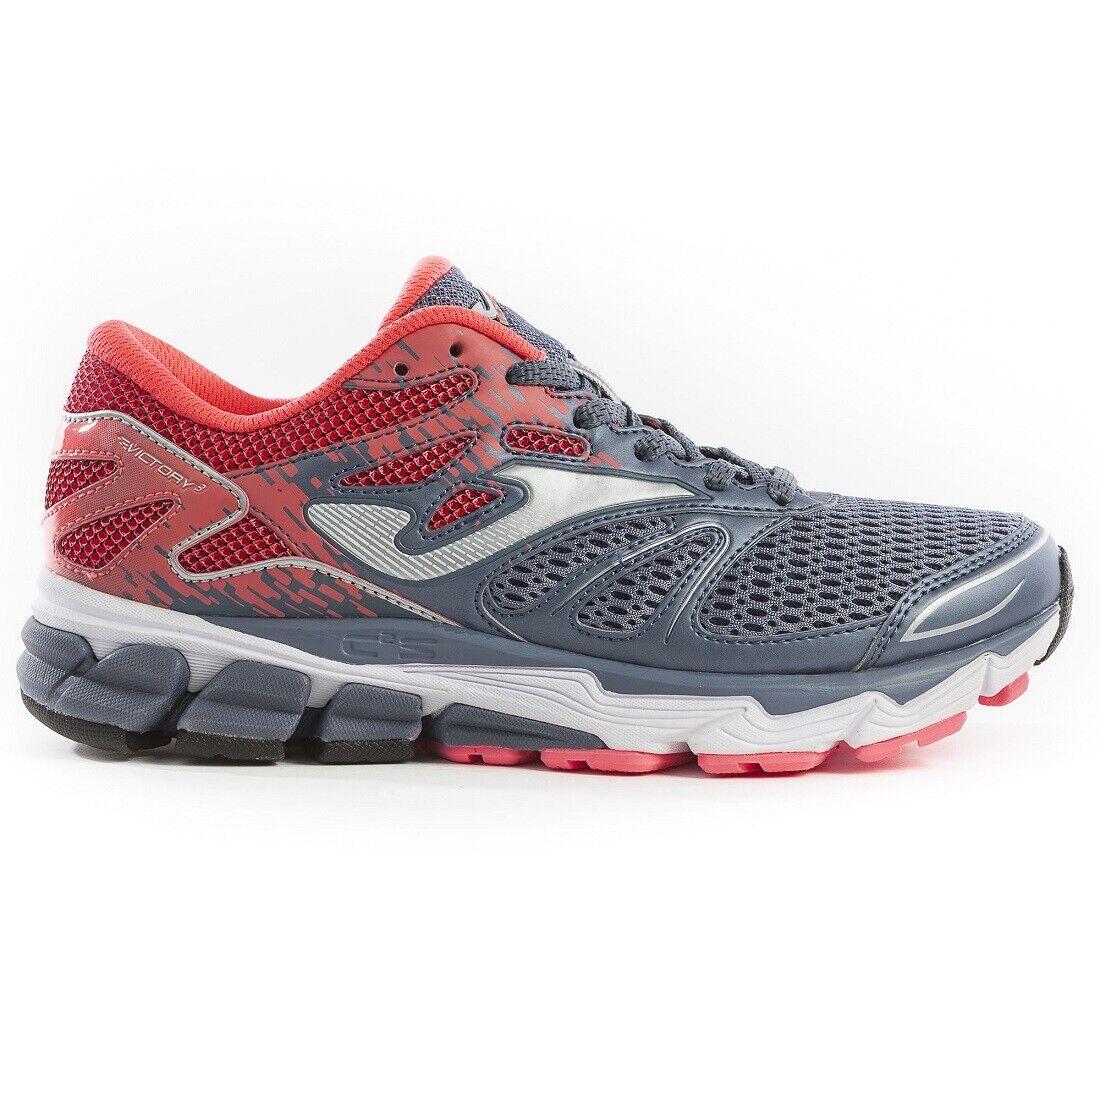 Joma zapatos Ginnastica mujer mujer mujer - R.Victory 912 gris  compra limitada